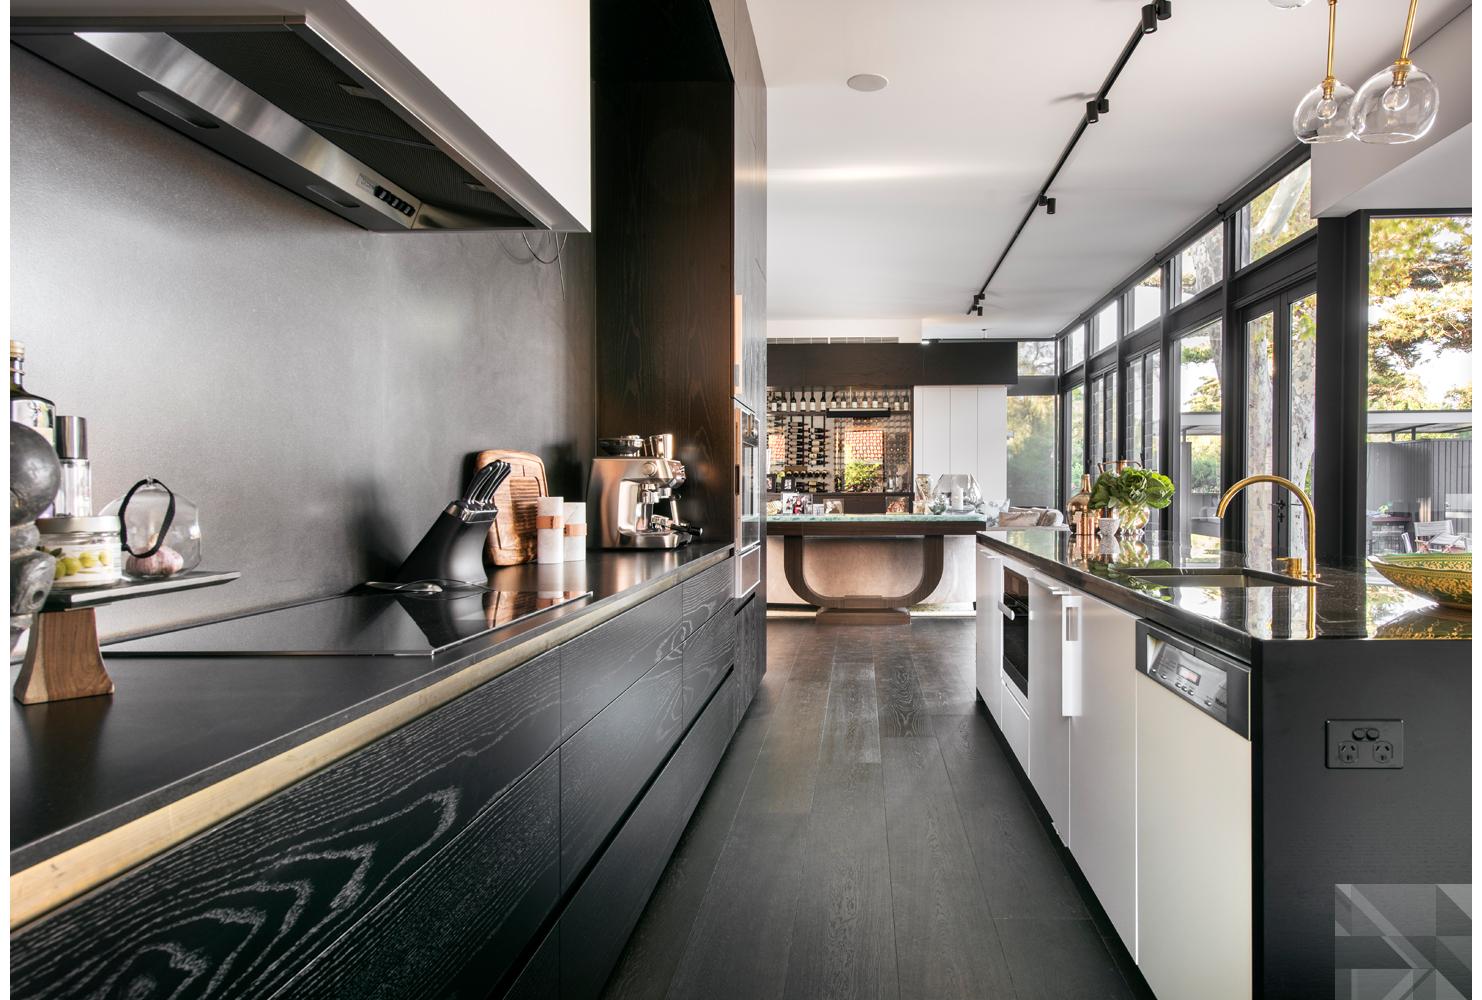 maek-luxury-home-design-inspiration-peppermintgrove-27v-kitchen-gallery-5.jpg